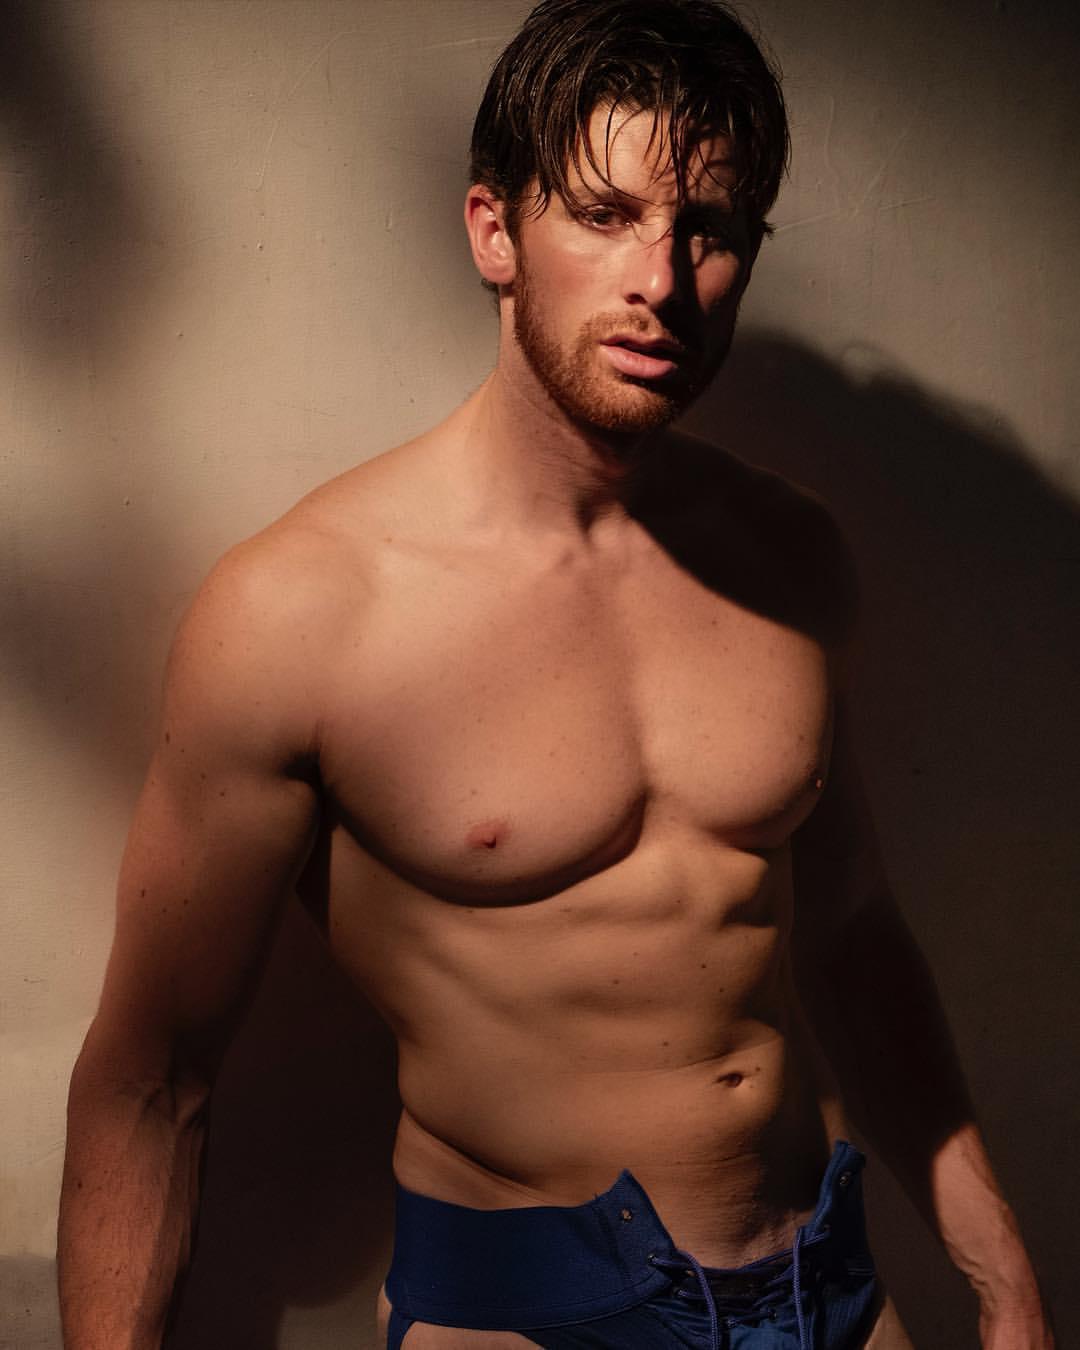 Shirtless Men On The Blog: David Thibault Mostra Il Sedere